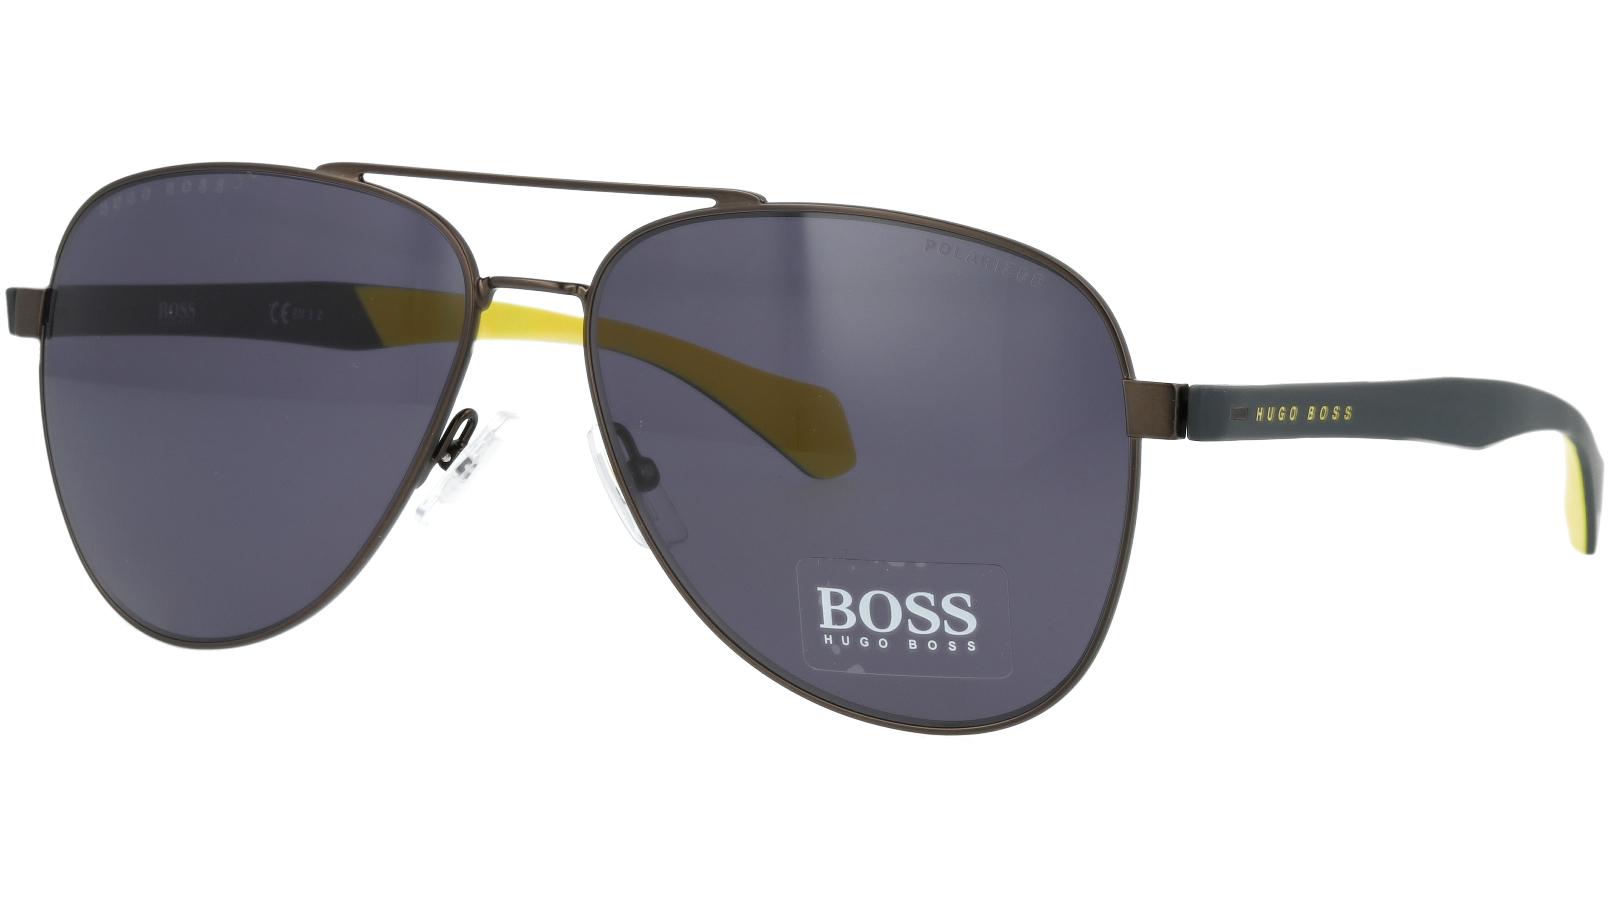 Hugo Boss BOSS0949FS N9PM9 58 Matt Sunglasses